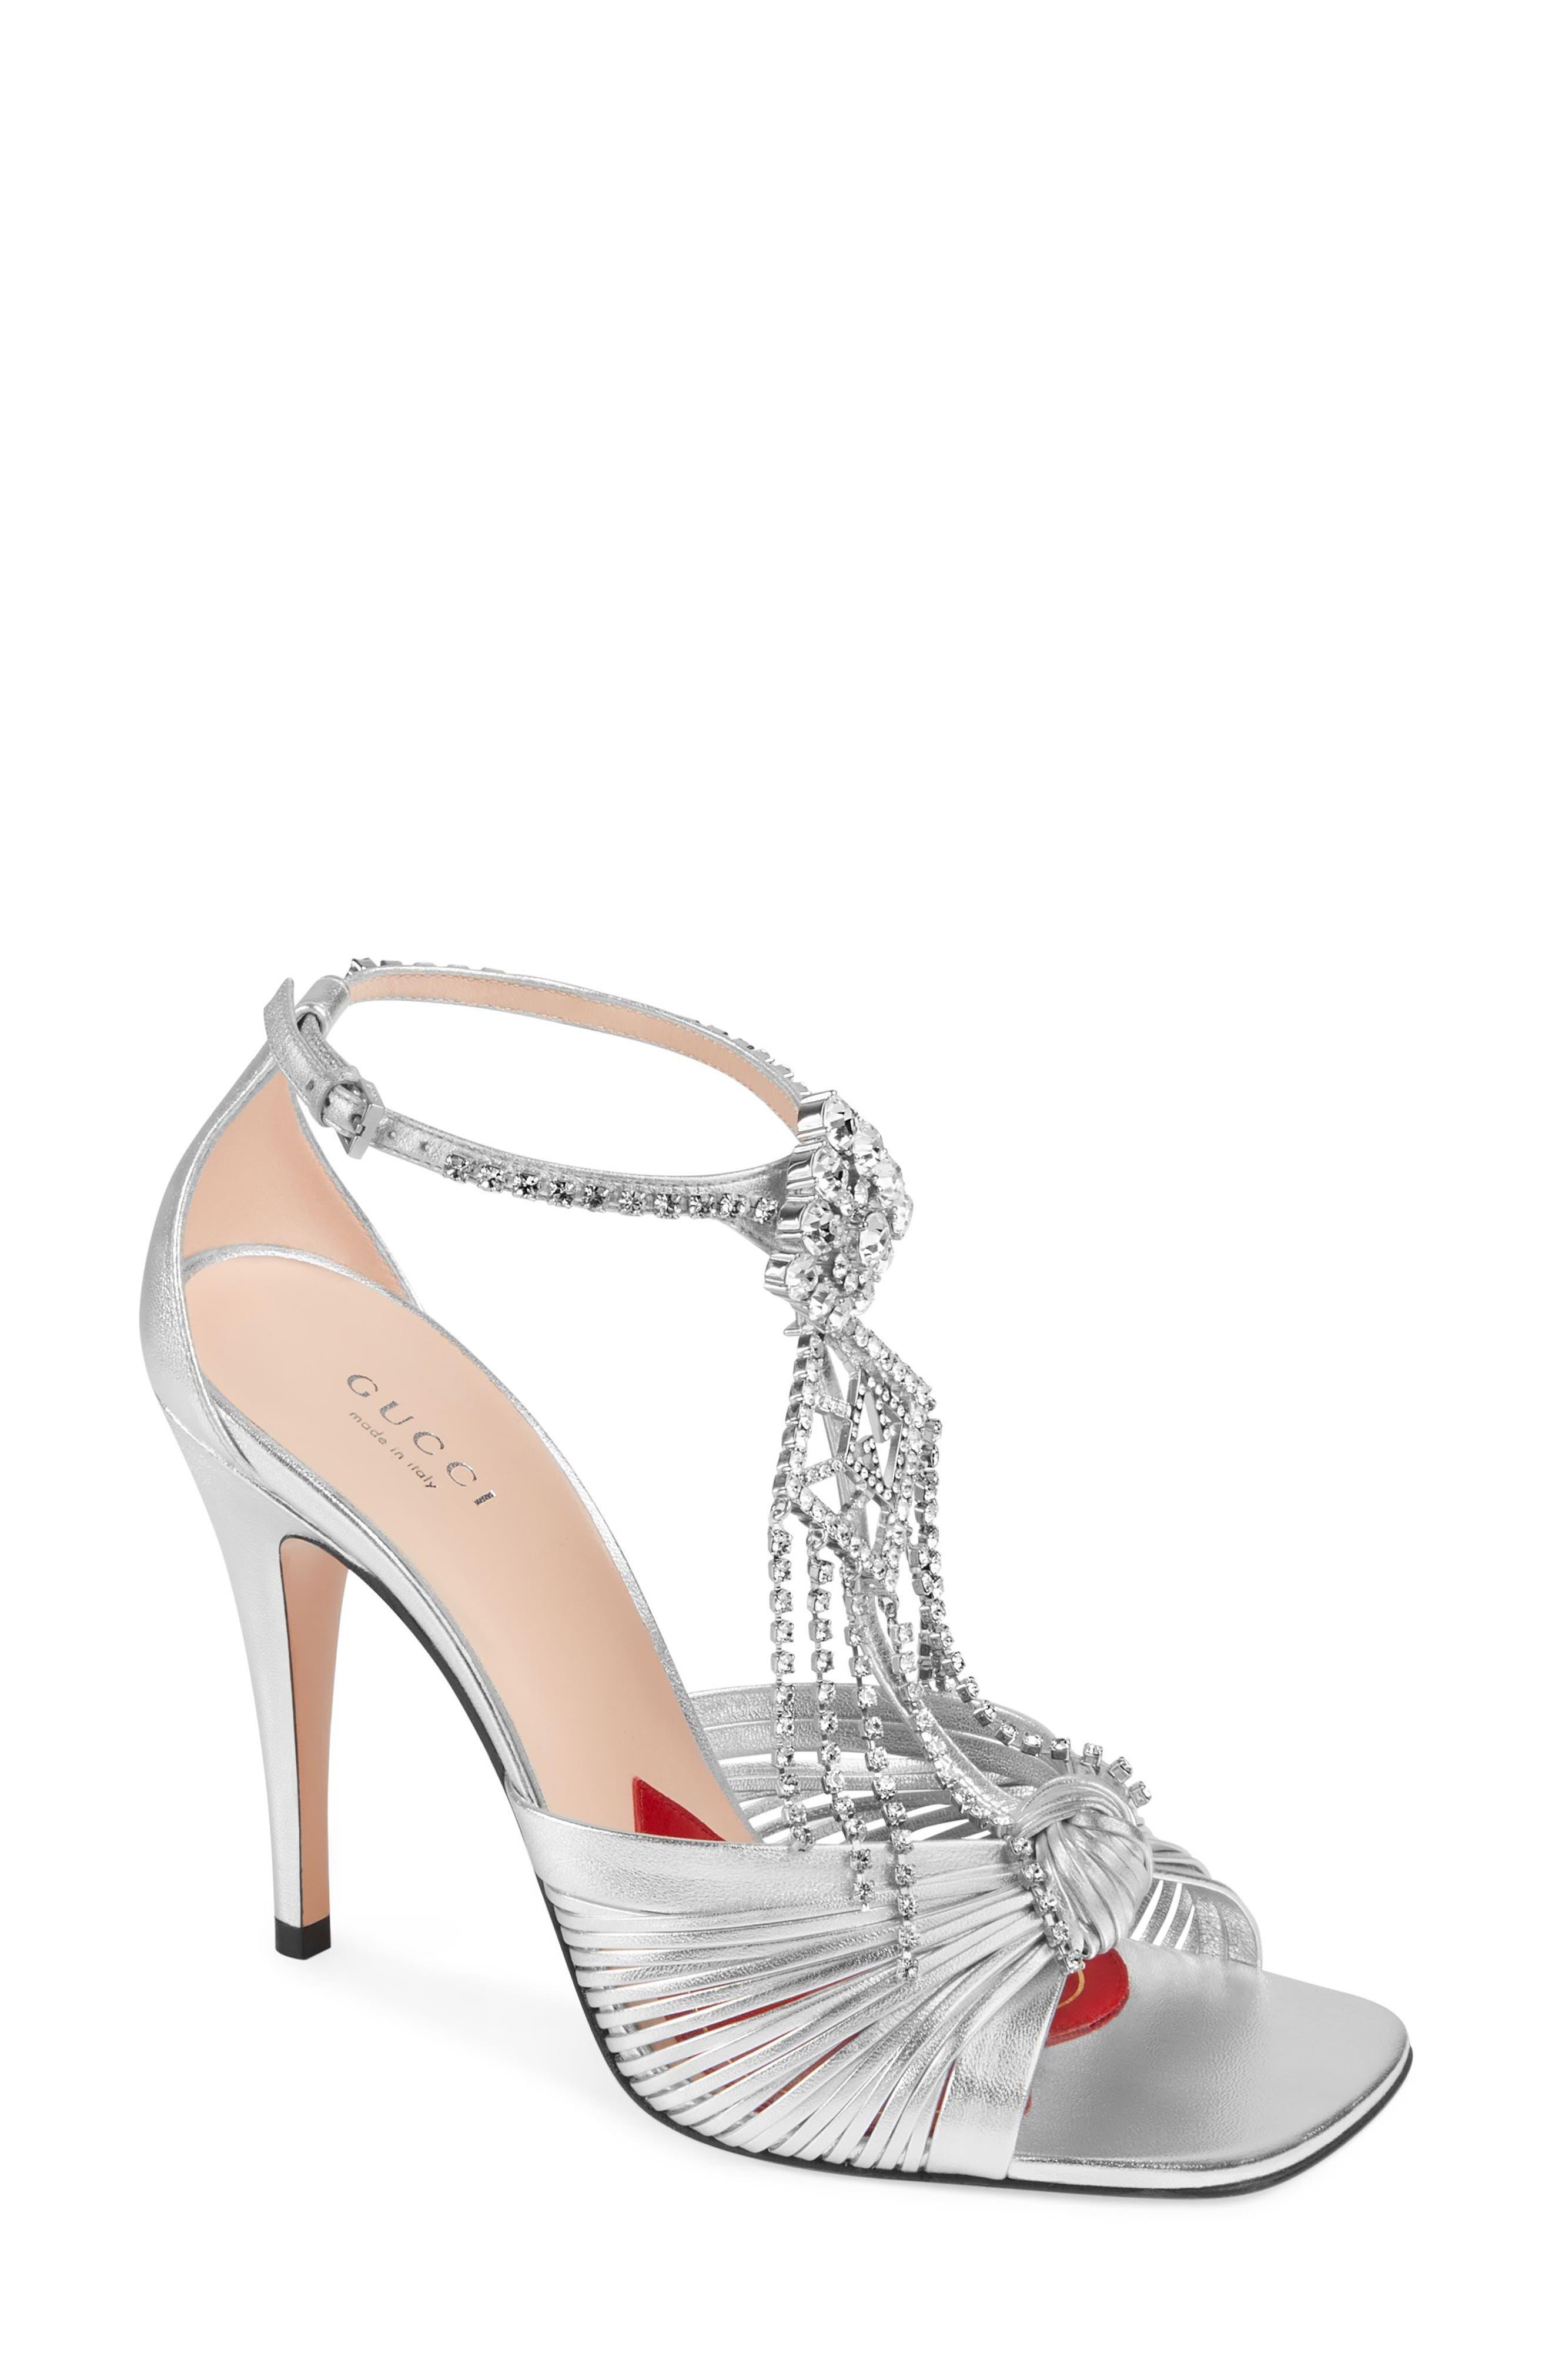 2b9334b8e341 Gucci Crawford Embellished Knot Sandal, Metallic